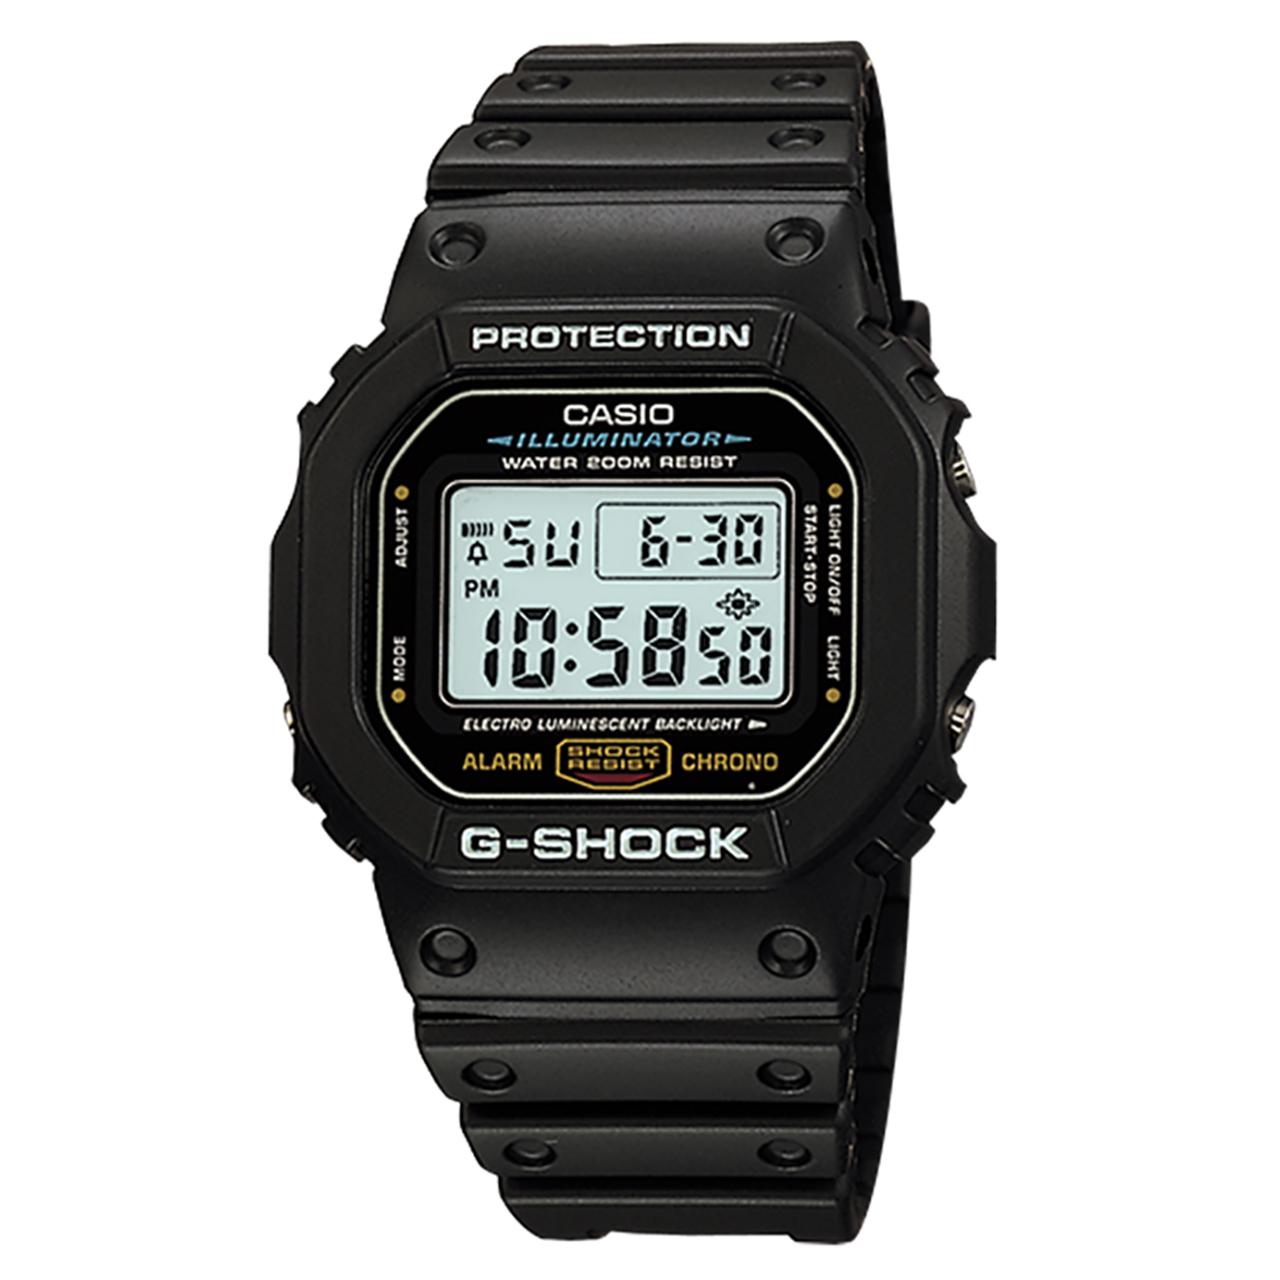 ساعت مچی دیجیتالی کاسیو جی شاک مدل DW-5600E-1VDF